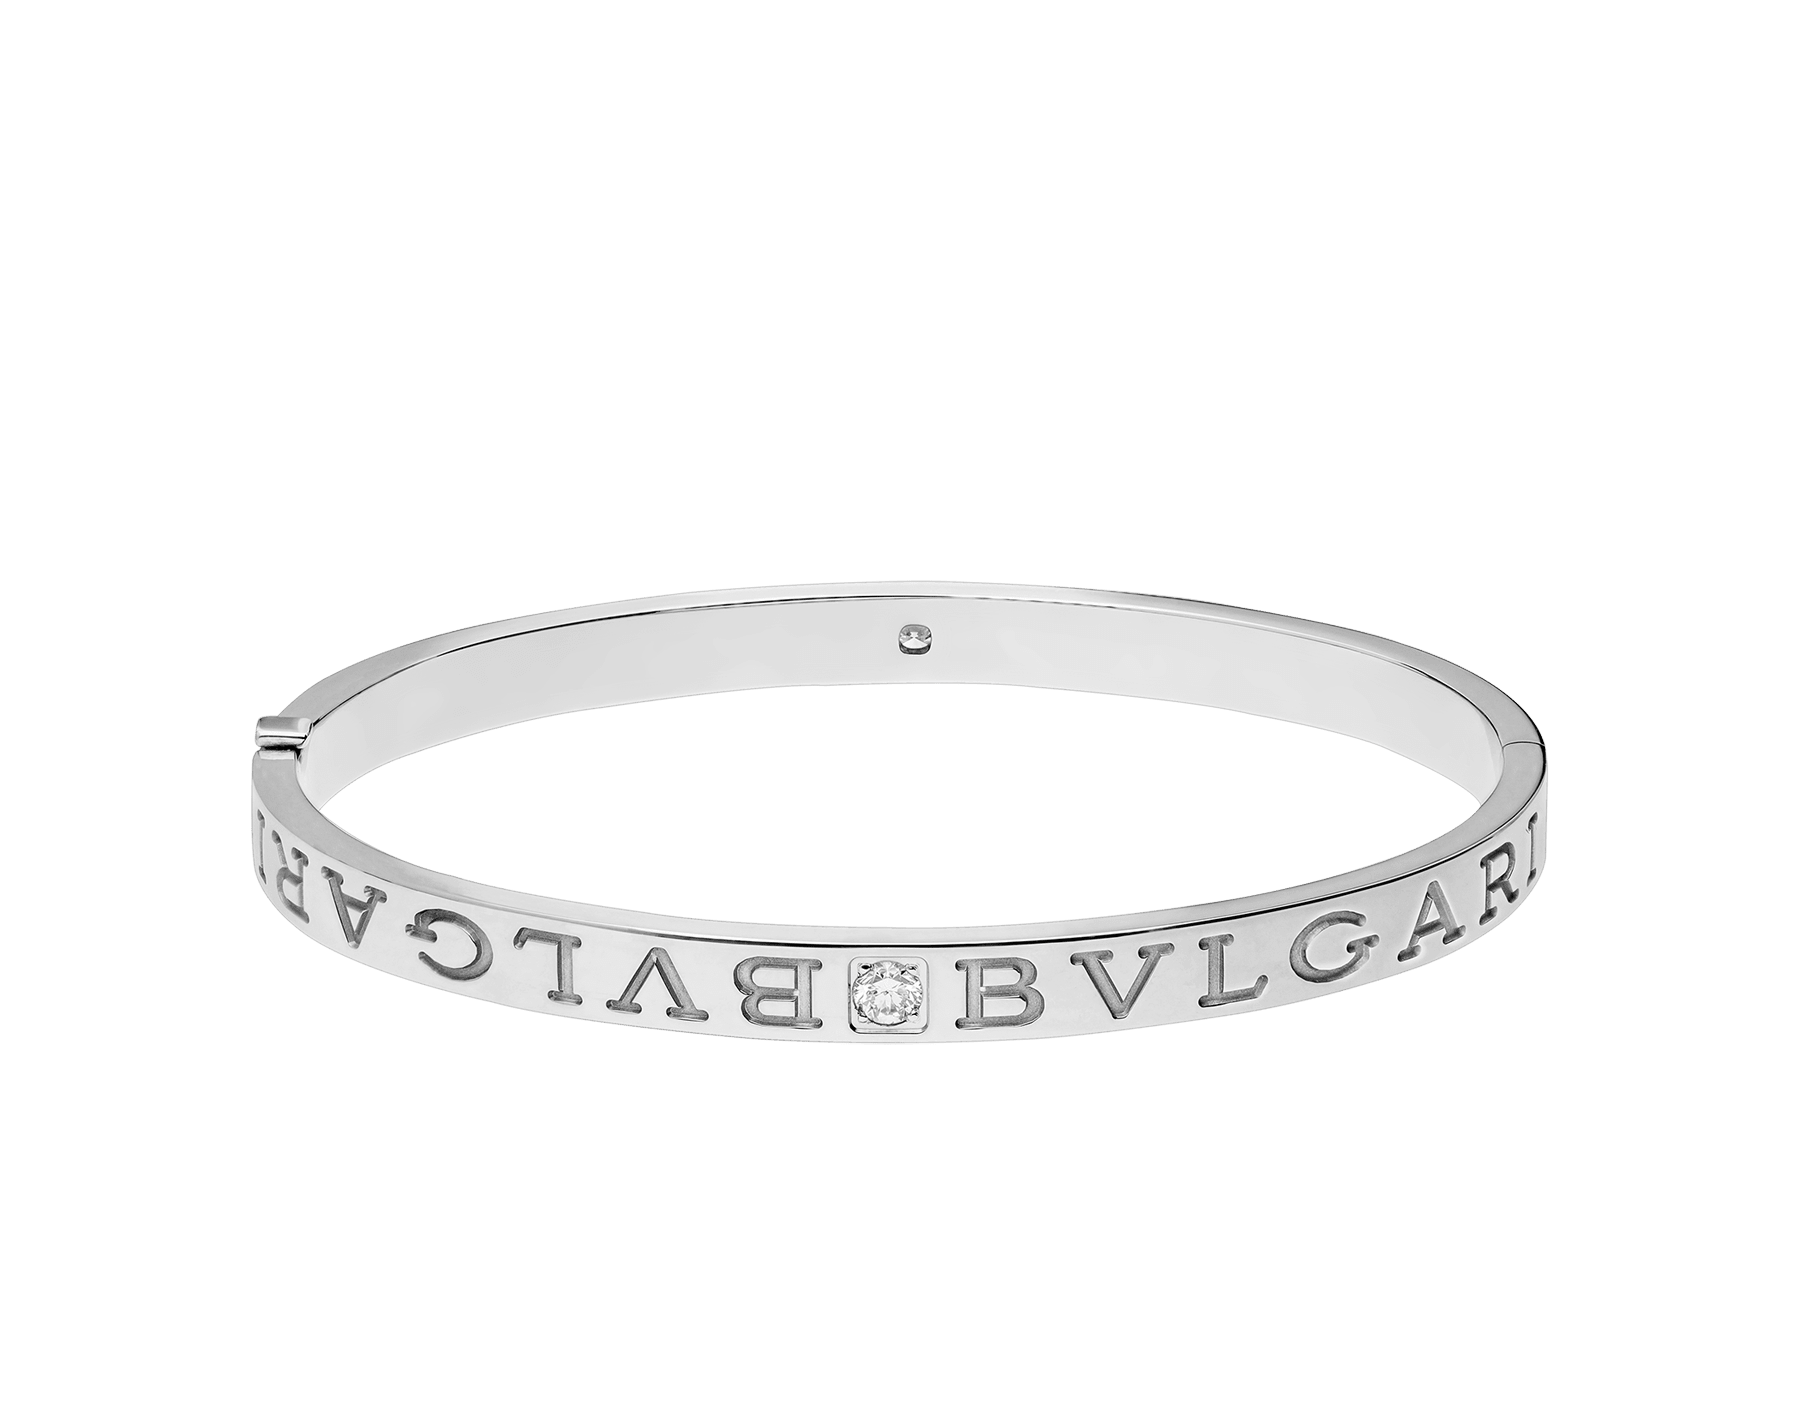 Bracelet jonc BVLGARI BVLGARI en or blanc 18K serti de diamants BR856790 image 2